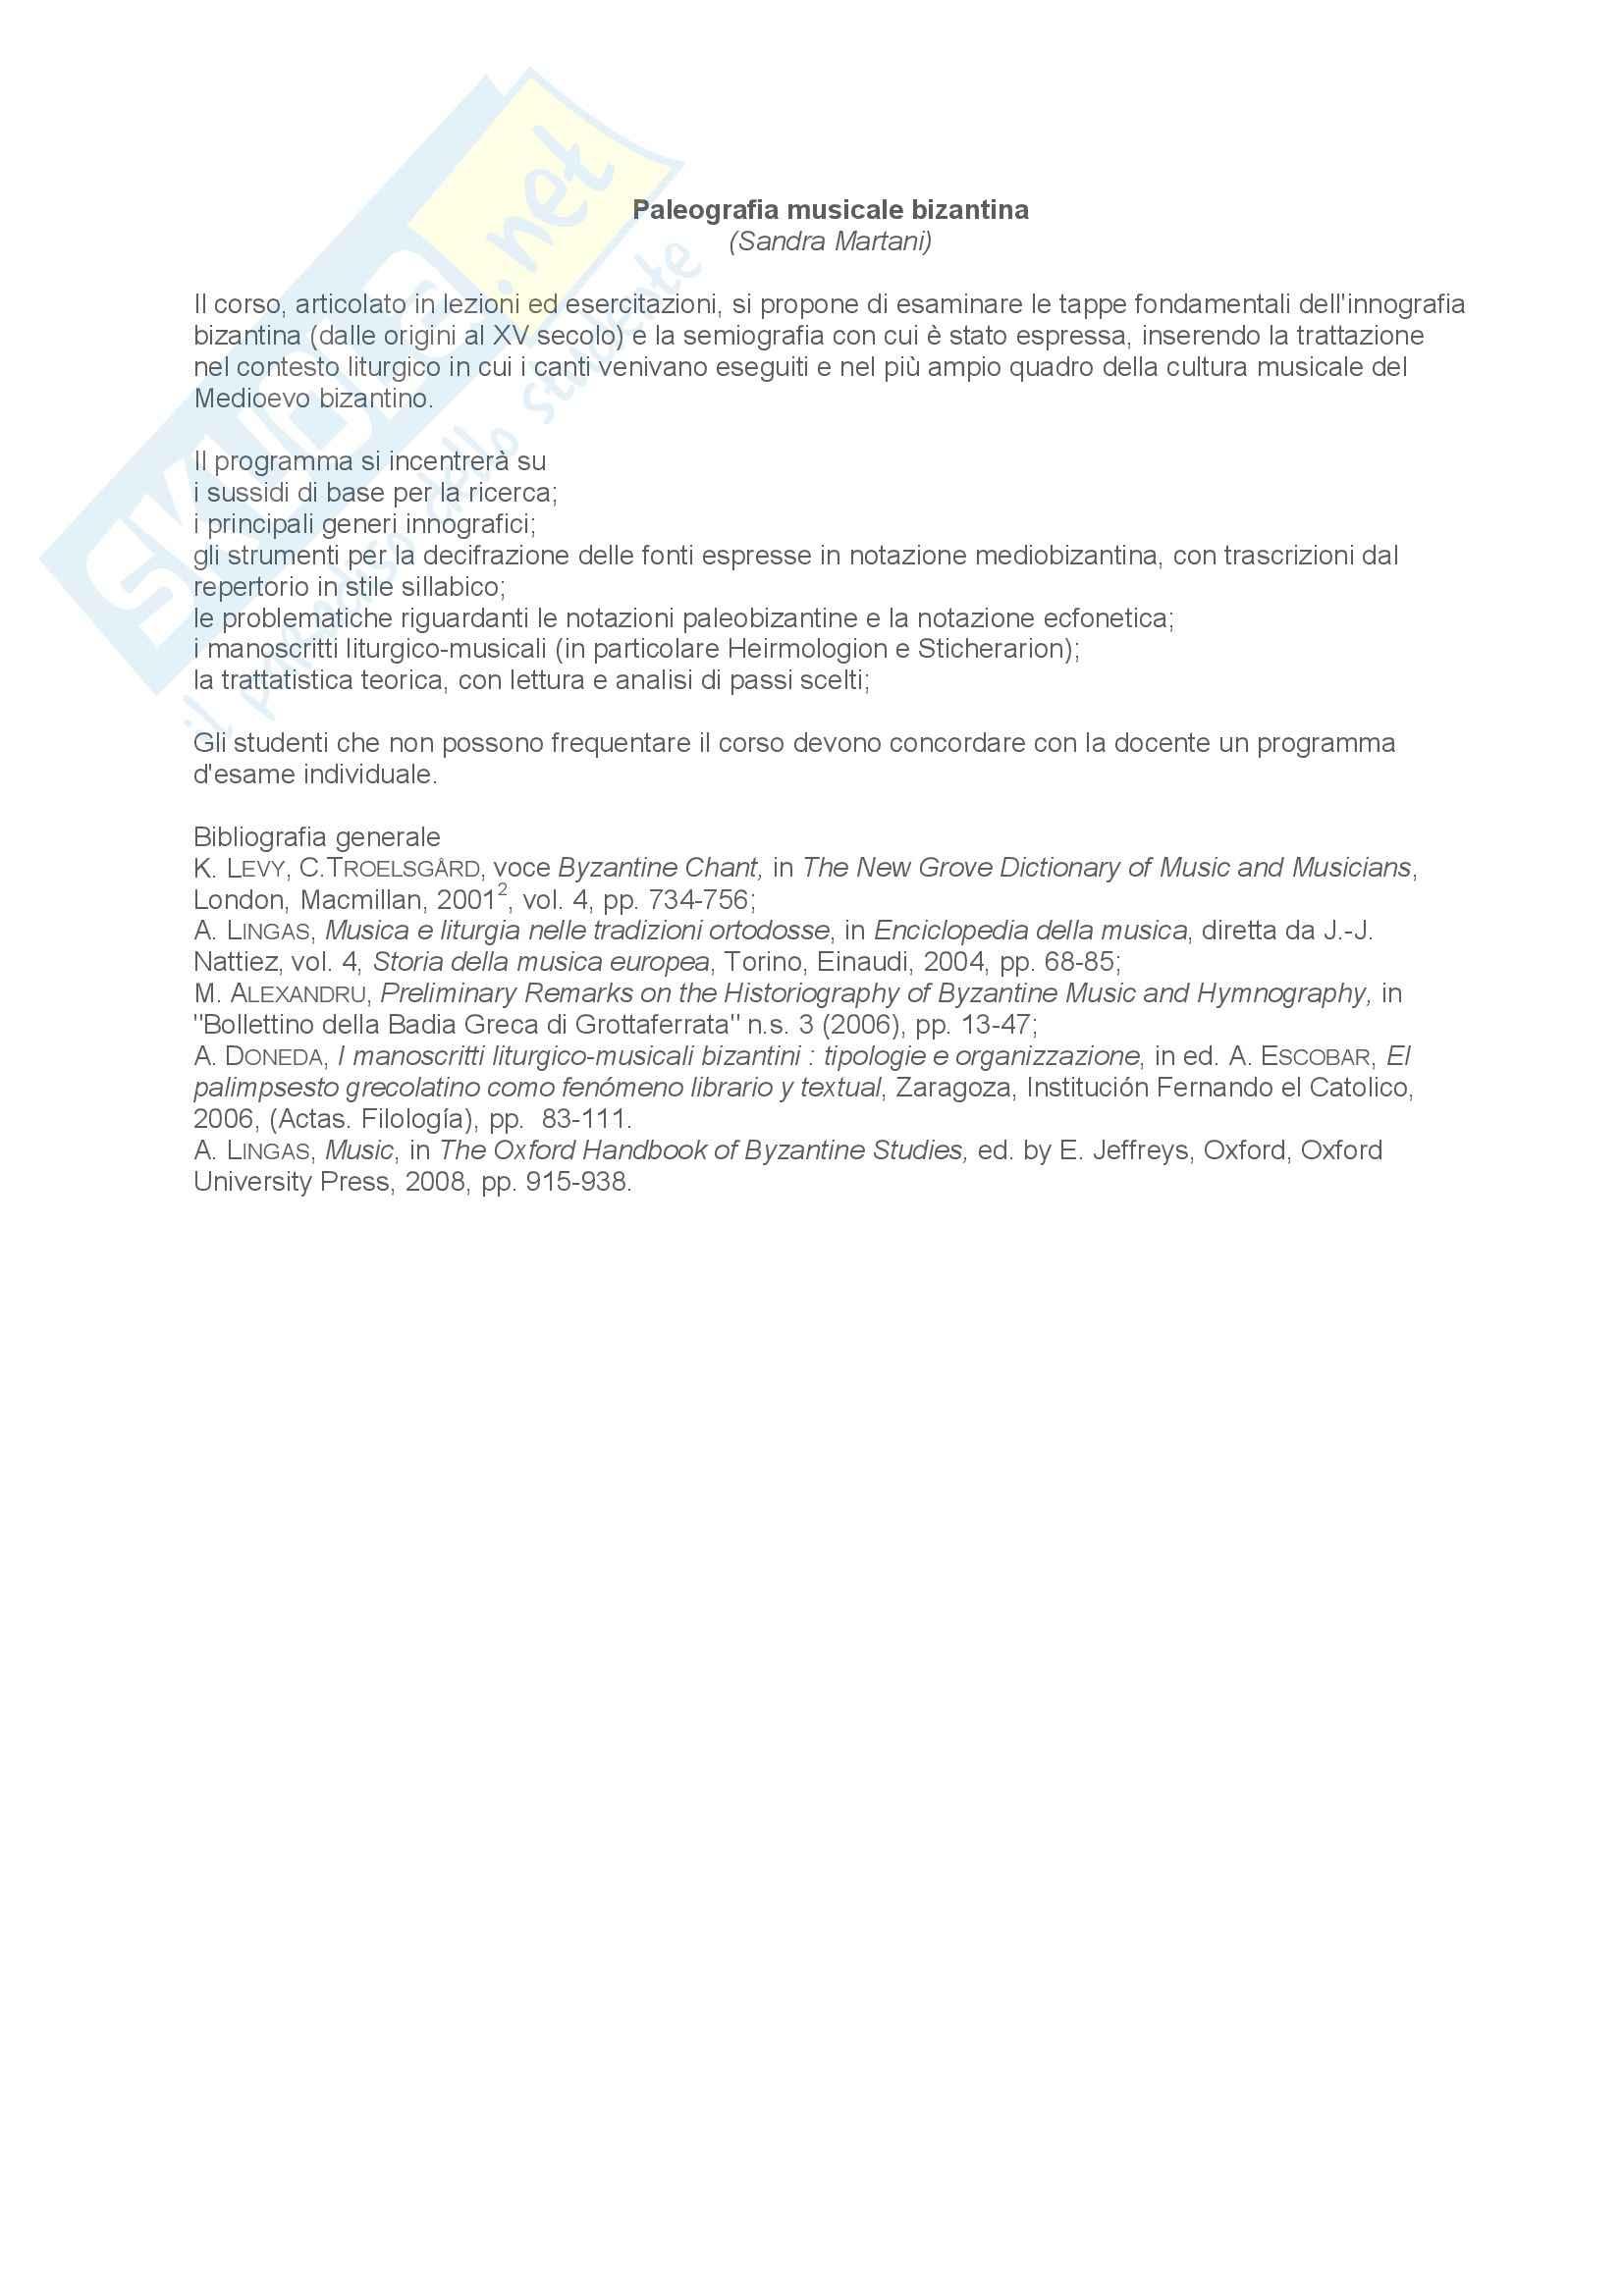 dispensa S. Martani Paleografia musicale bizantina